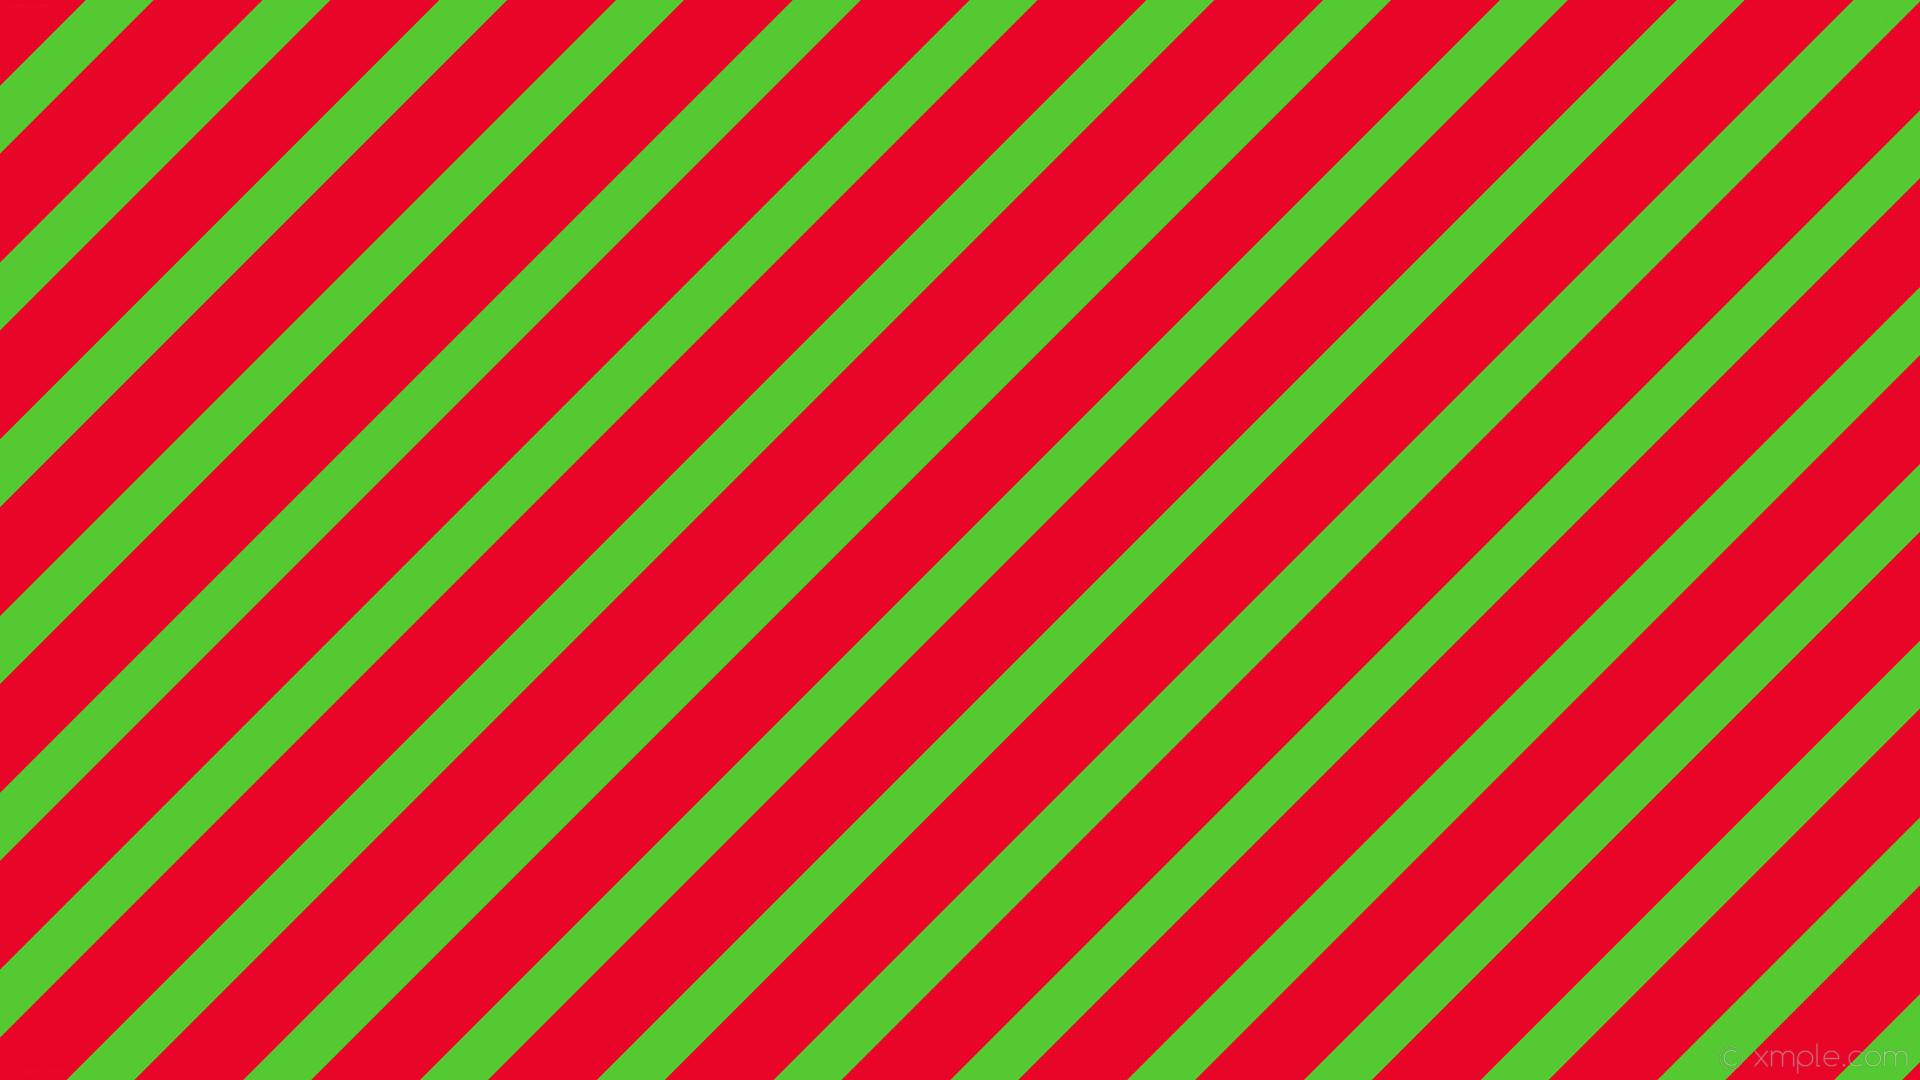 wallpaper stripes red streaks green lines #55c931 #e90527 diagonal 45° 48px  77px